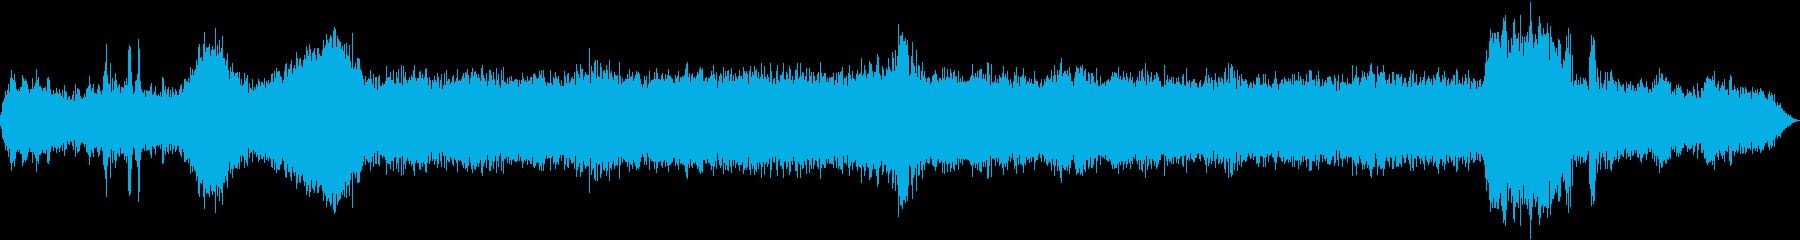 INT:加速、安定した速度で駆動、減速の再生済みの波形